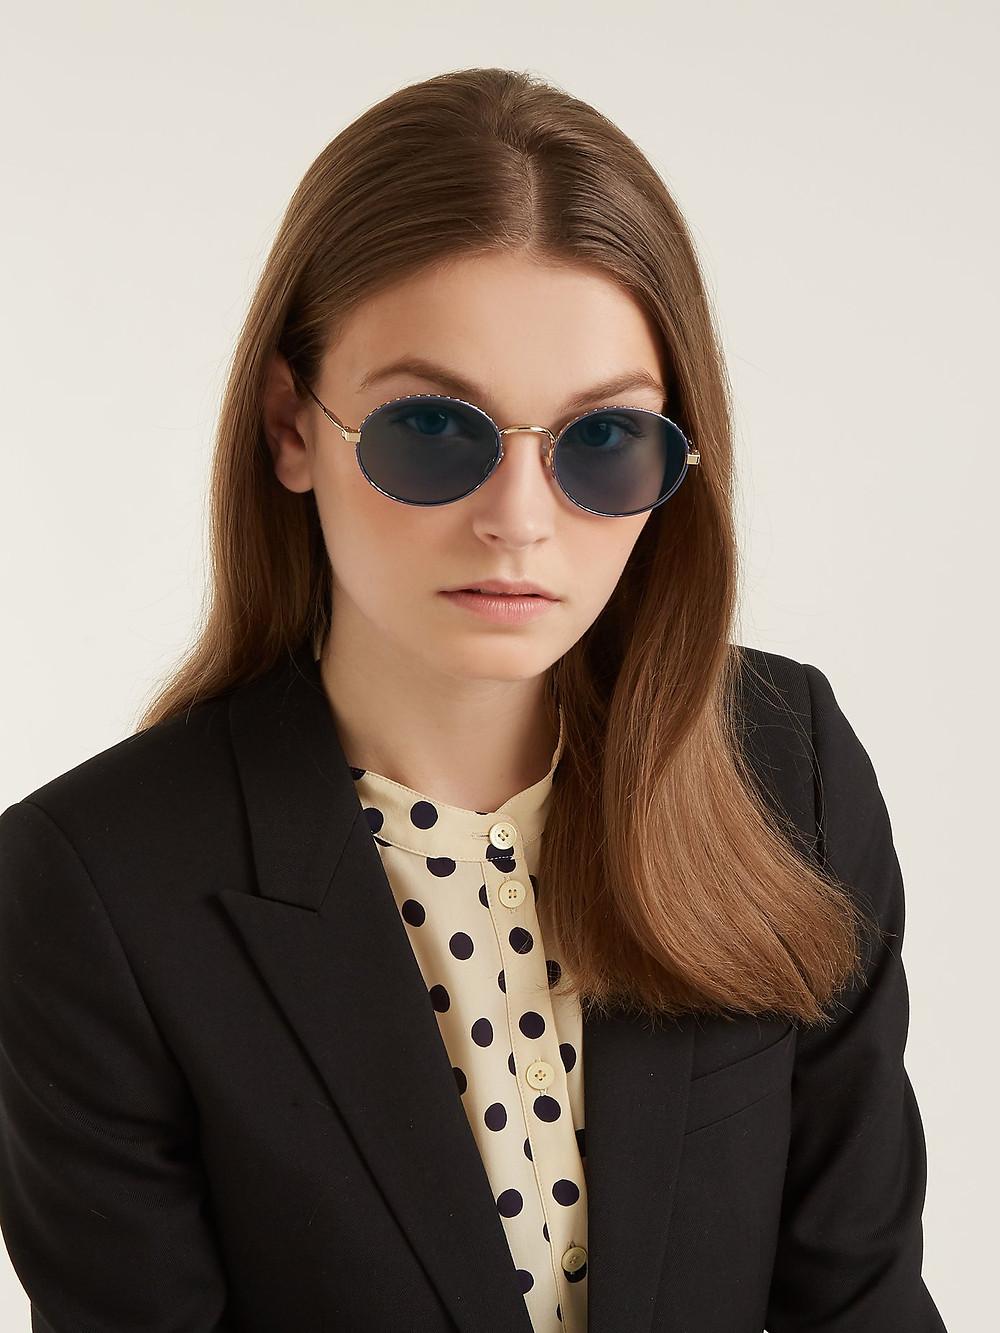 Givenchy Oval-frame metal sunglasses $240